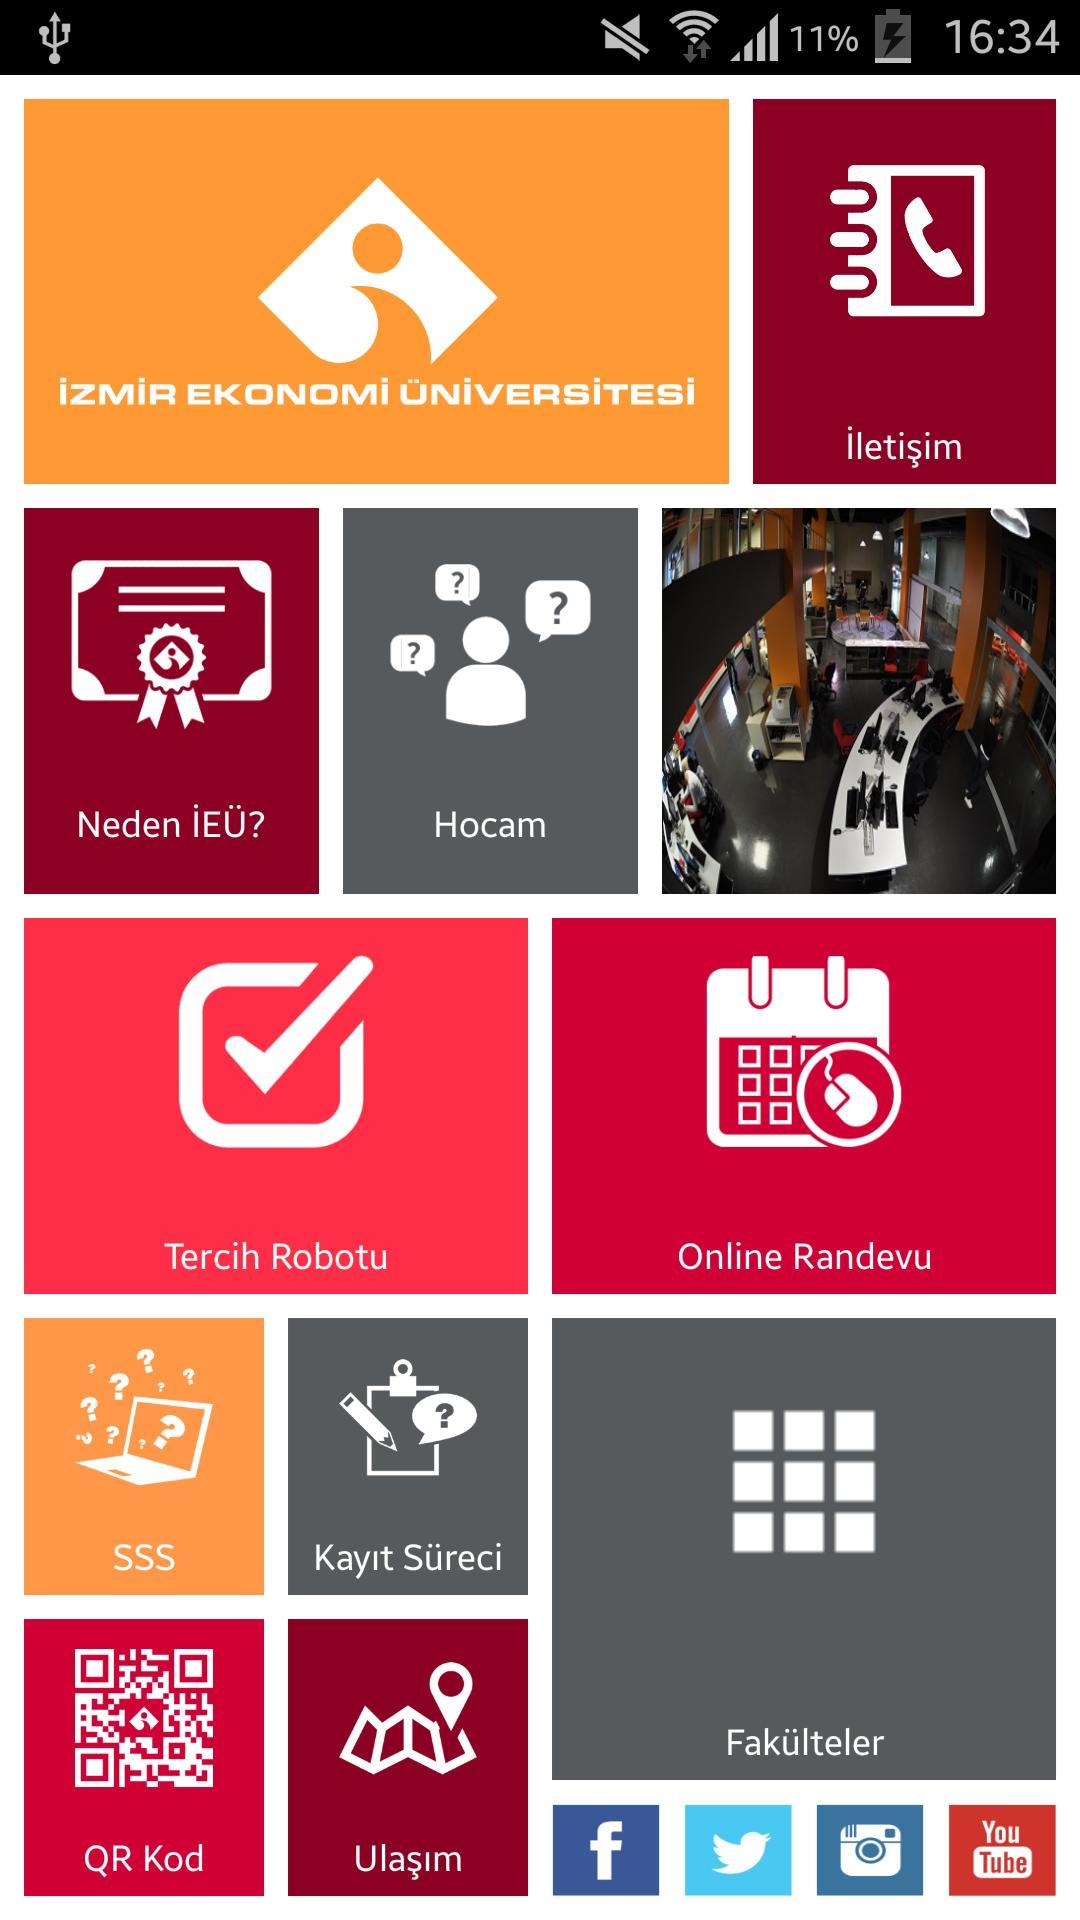 Izmir Ekonomi Universitesi For Android Apk Download